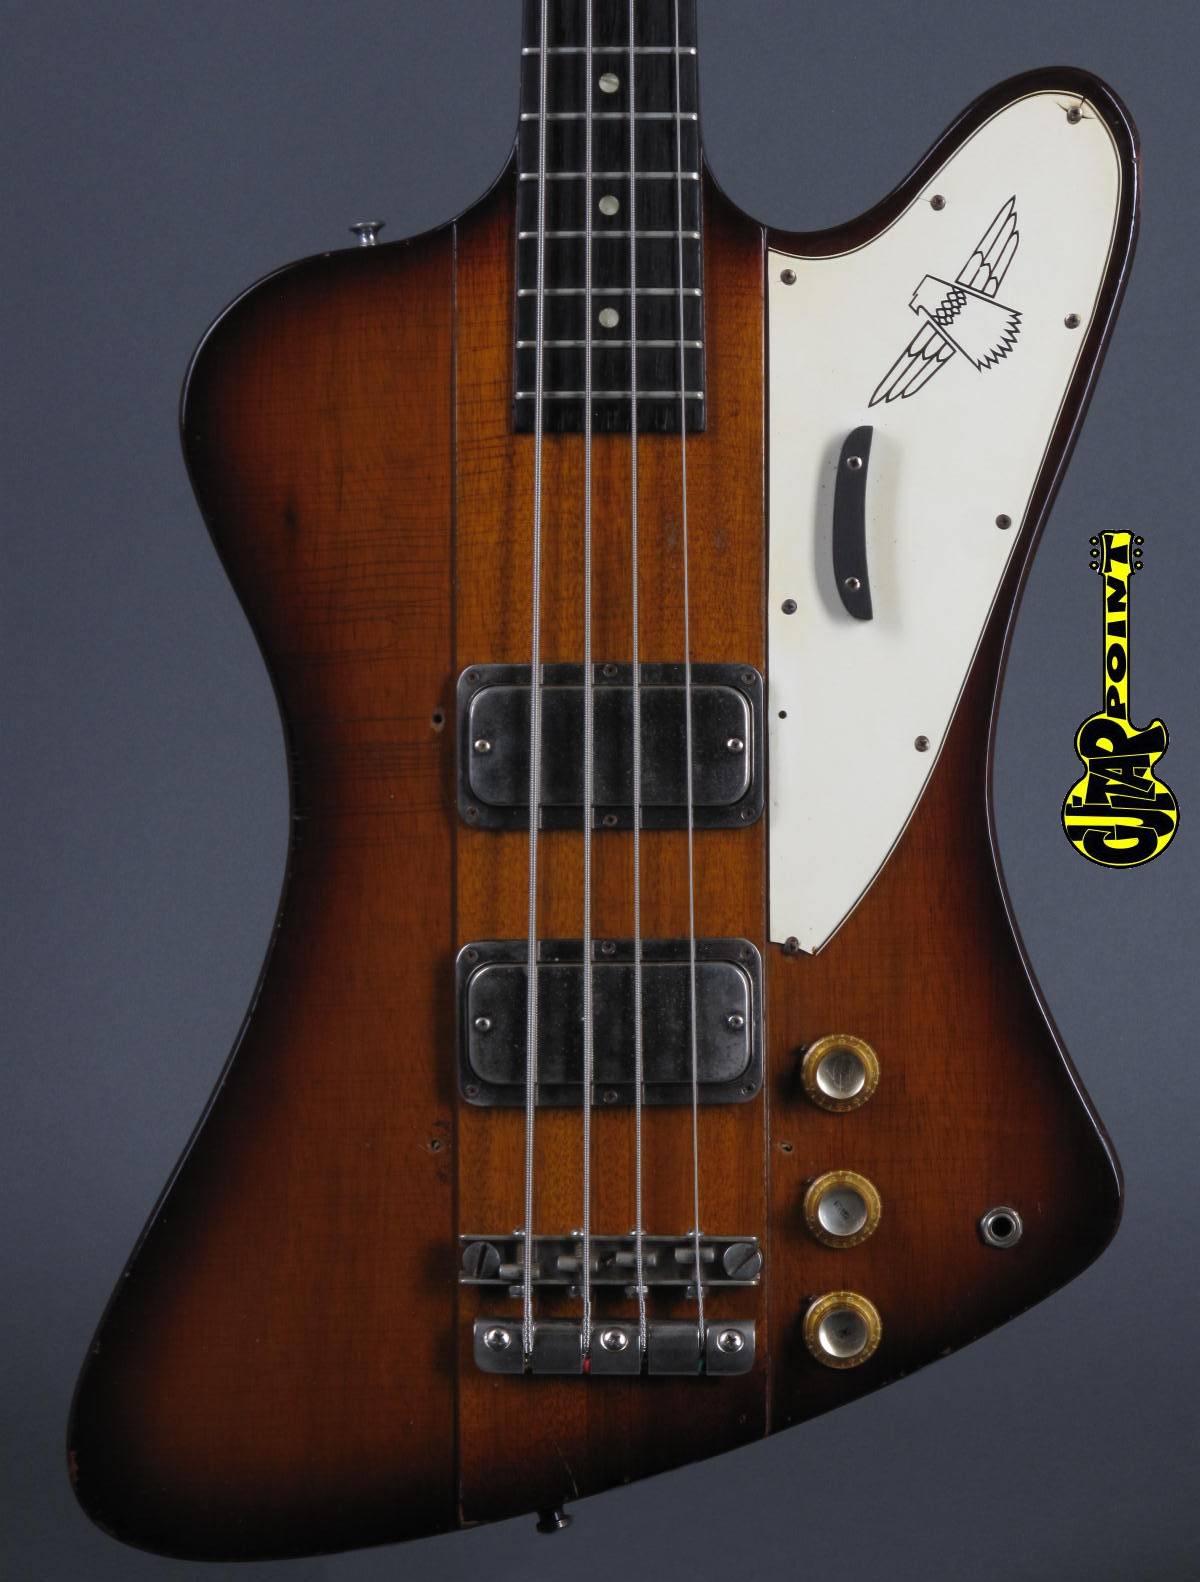 1964 Gibson Thunderbird IV Reverse Bass - Sunburst